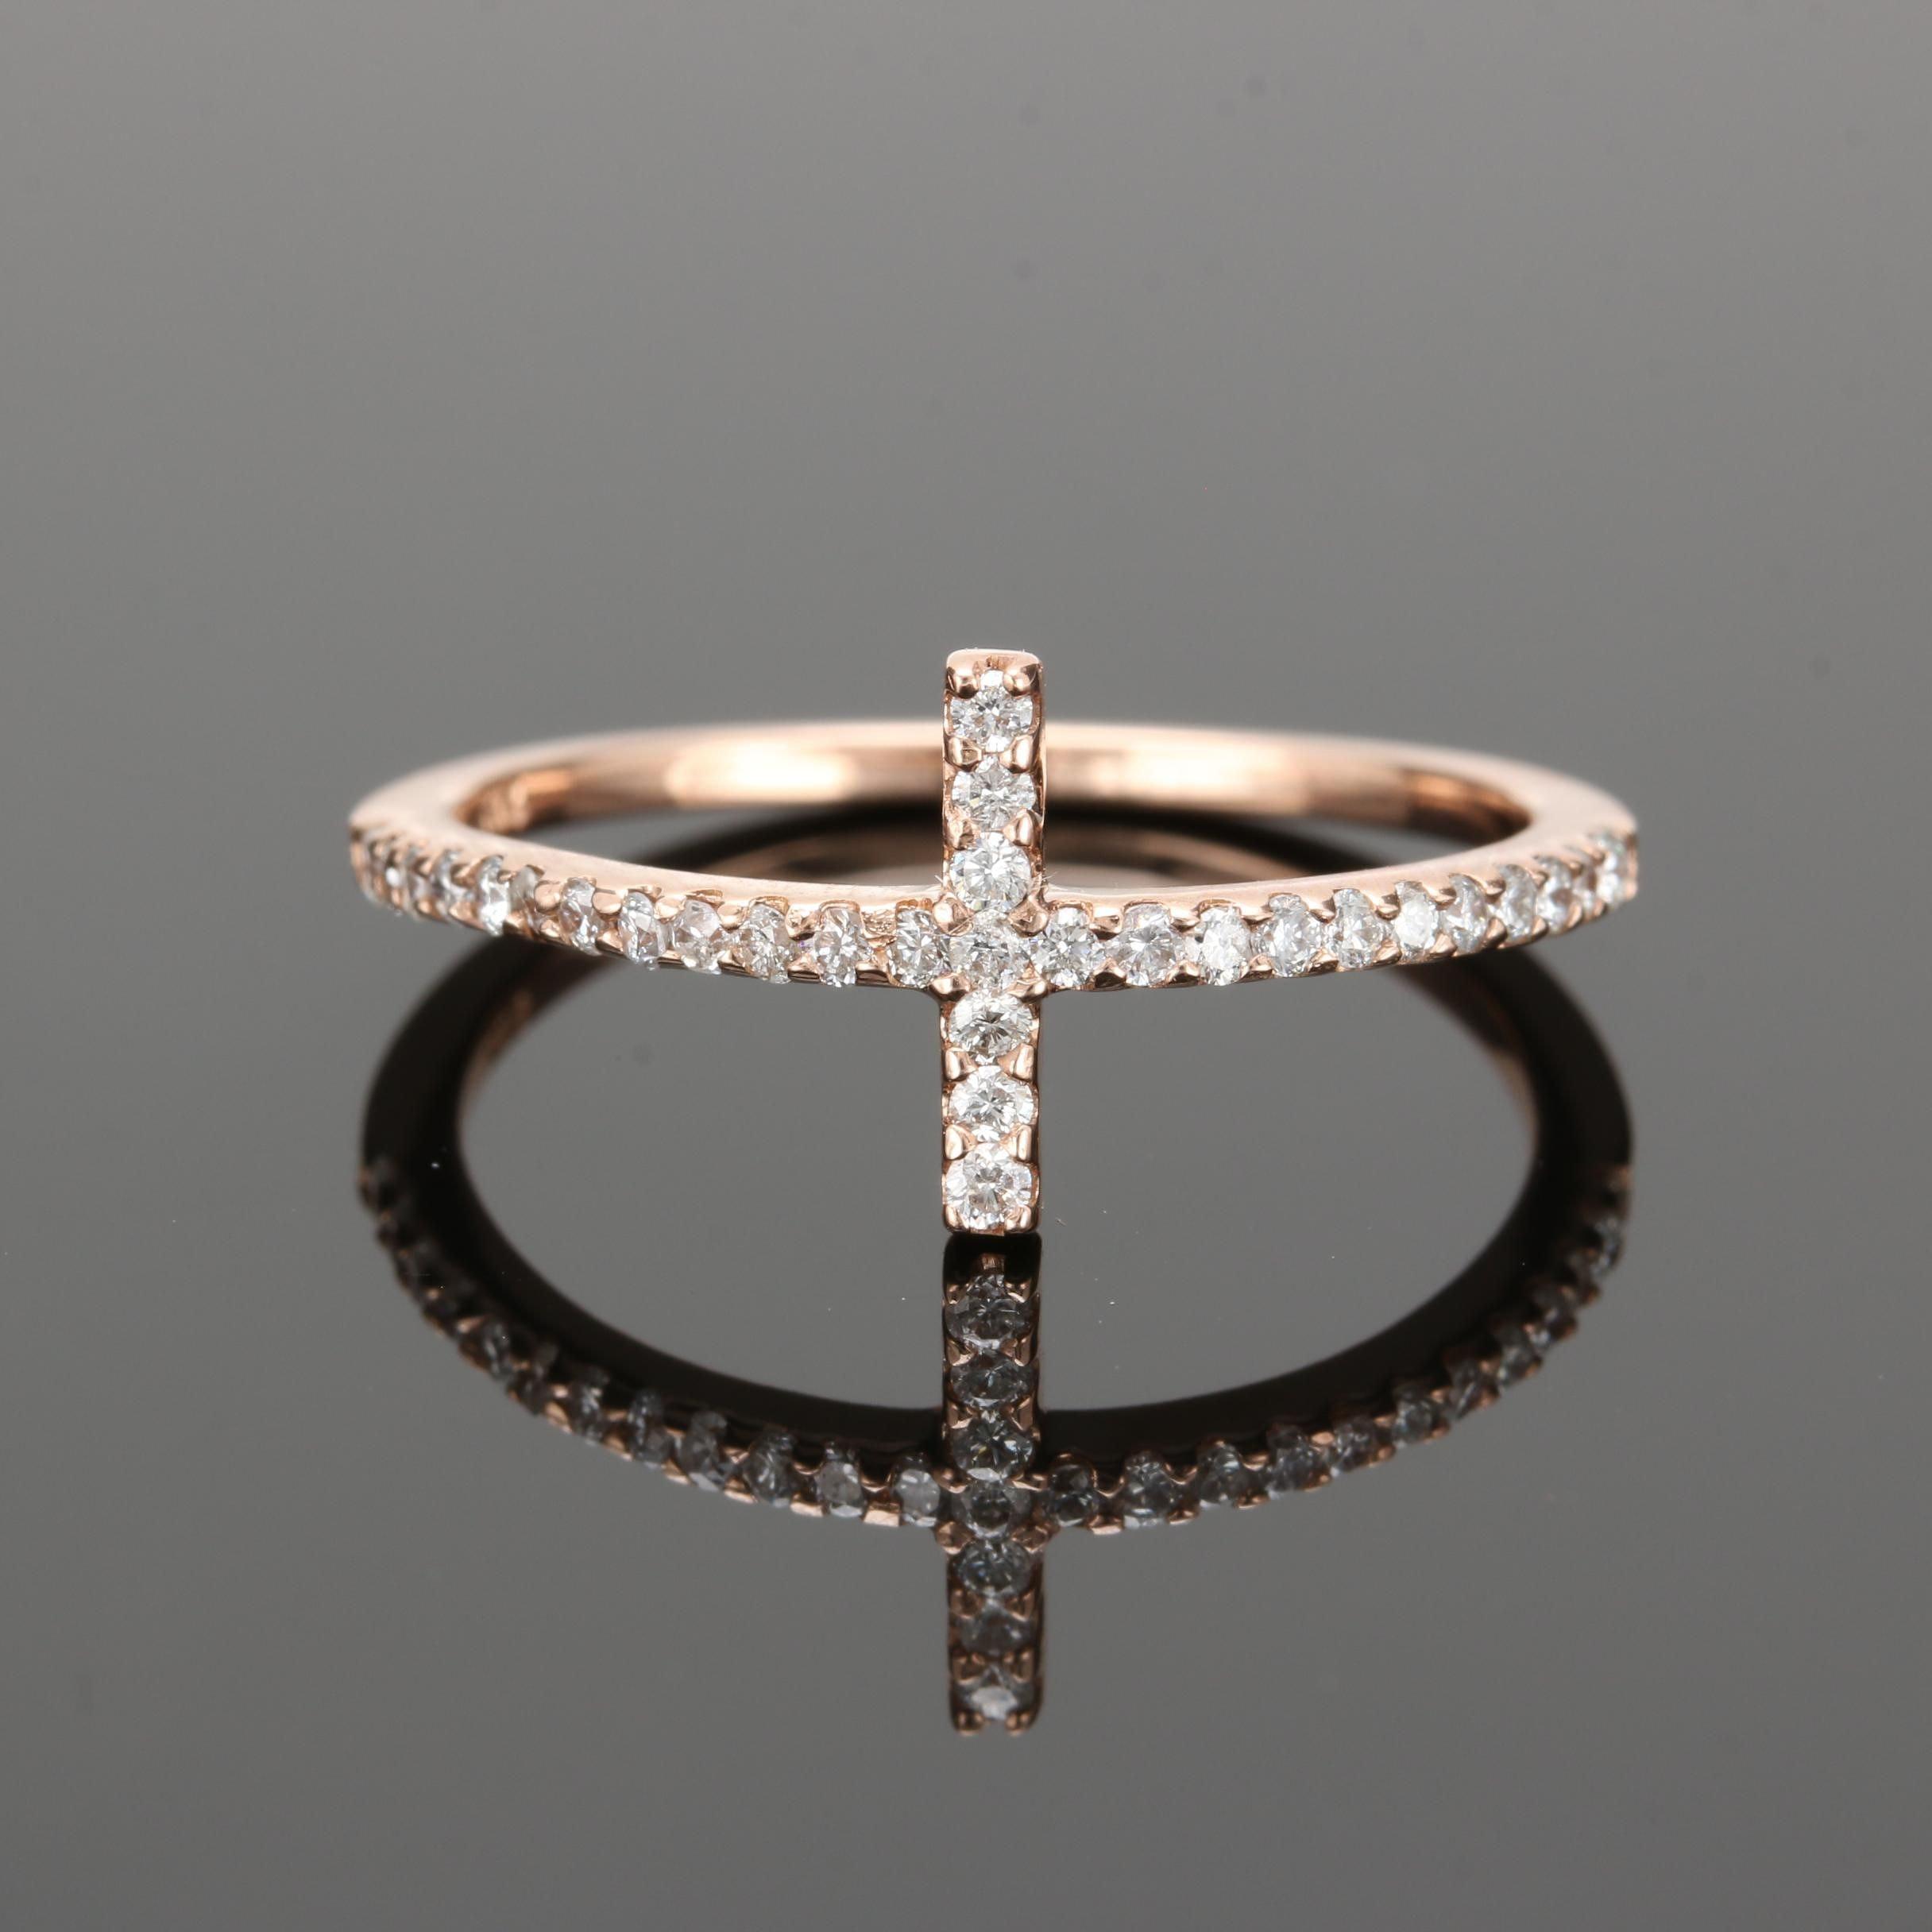 14K Yellow Gold Diamond Bar Ring